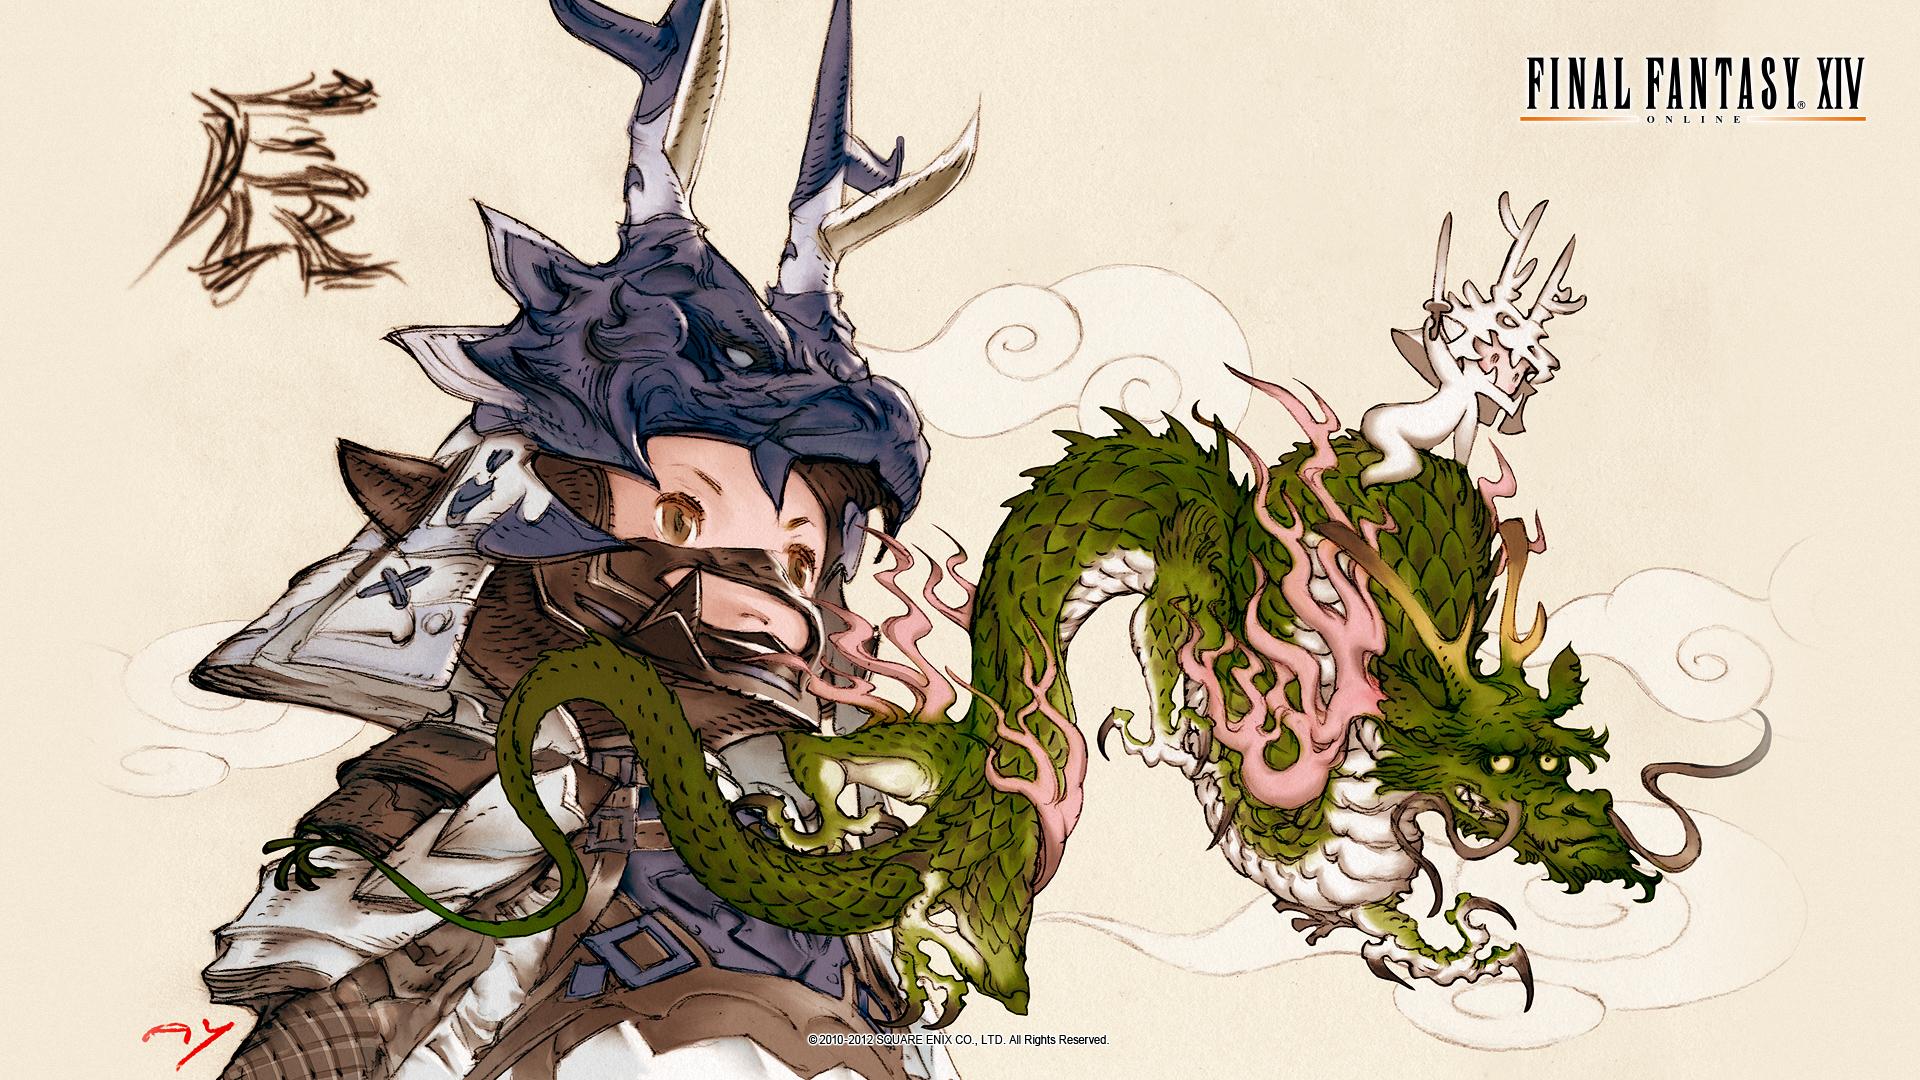 Final Fantasy XIV wallpapers | Final Fantasy Wiki | Fandom powered